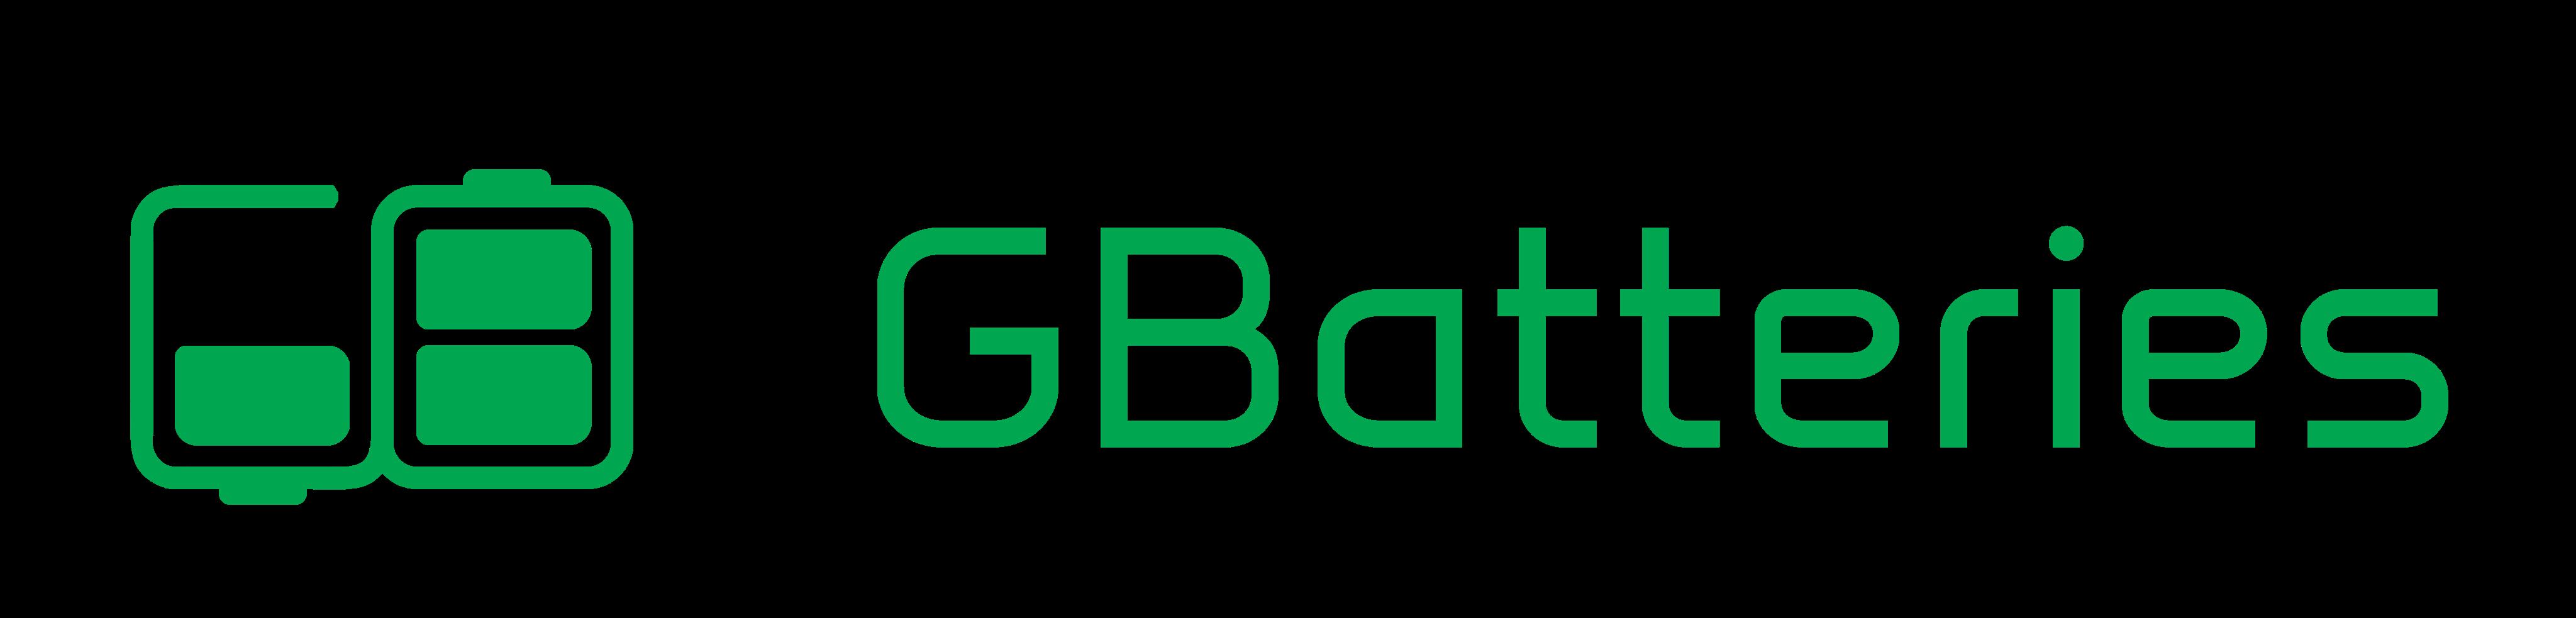 GBatteries logo